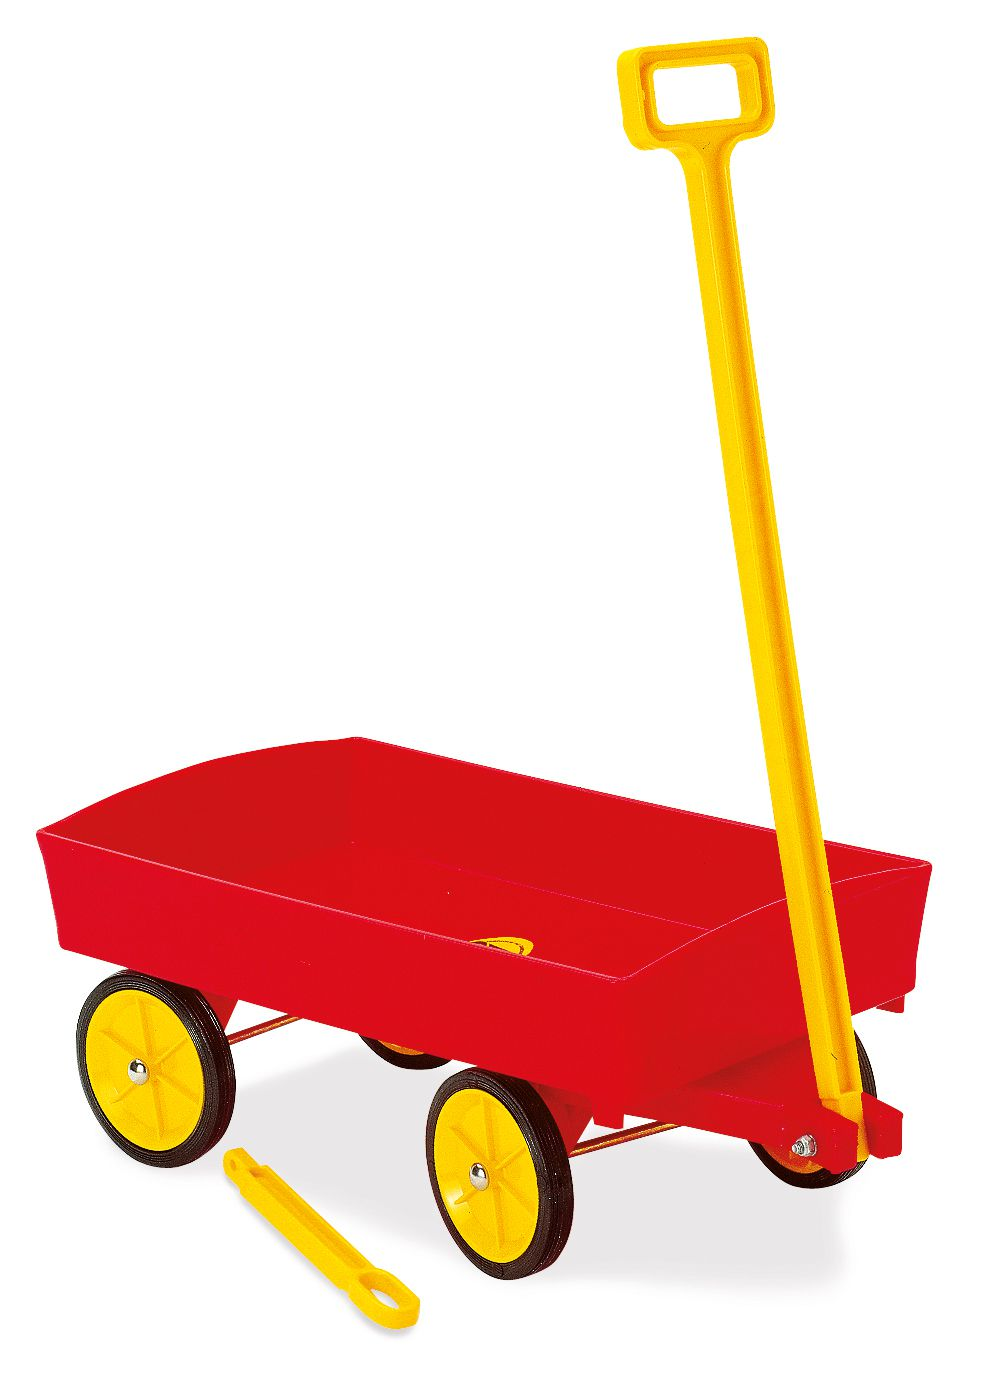 Vozík s gumovými koly Dantoy